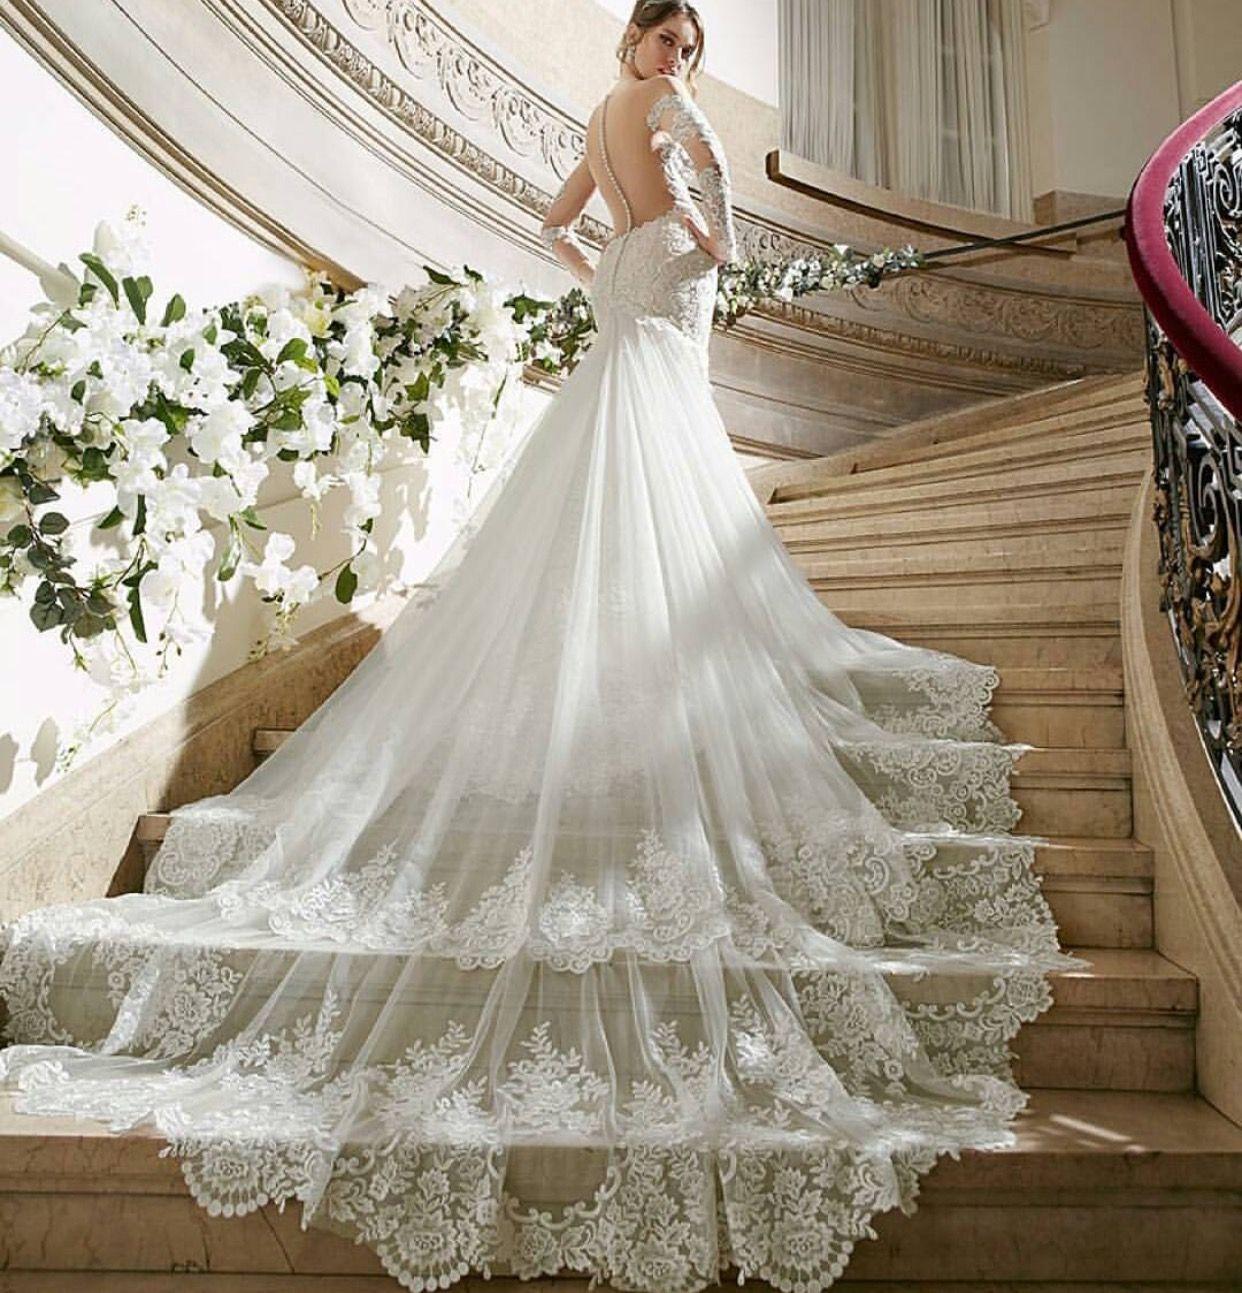 Pin von Mashallah Leelah auf Wedding Dresses & Cakes! | Pinterest ...